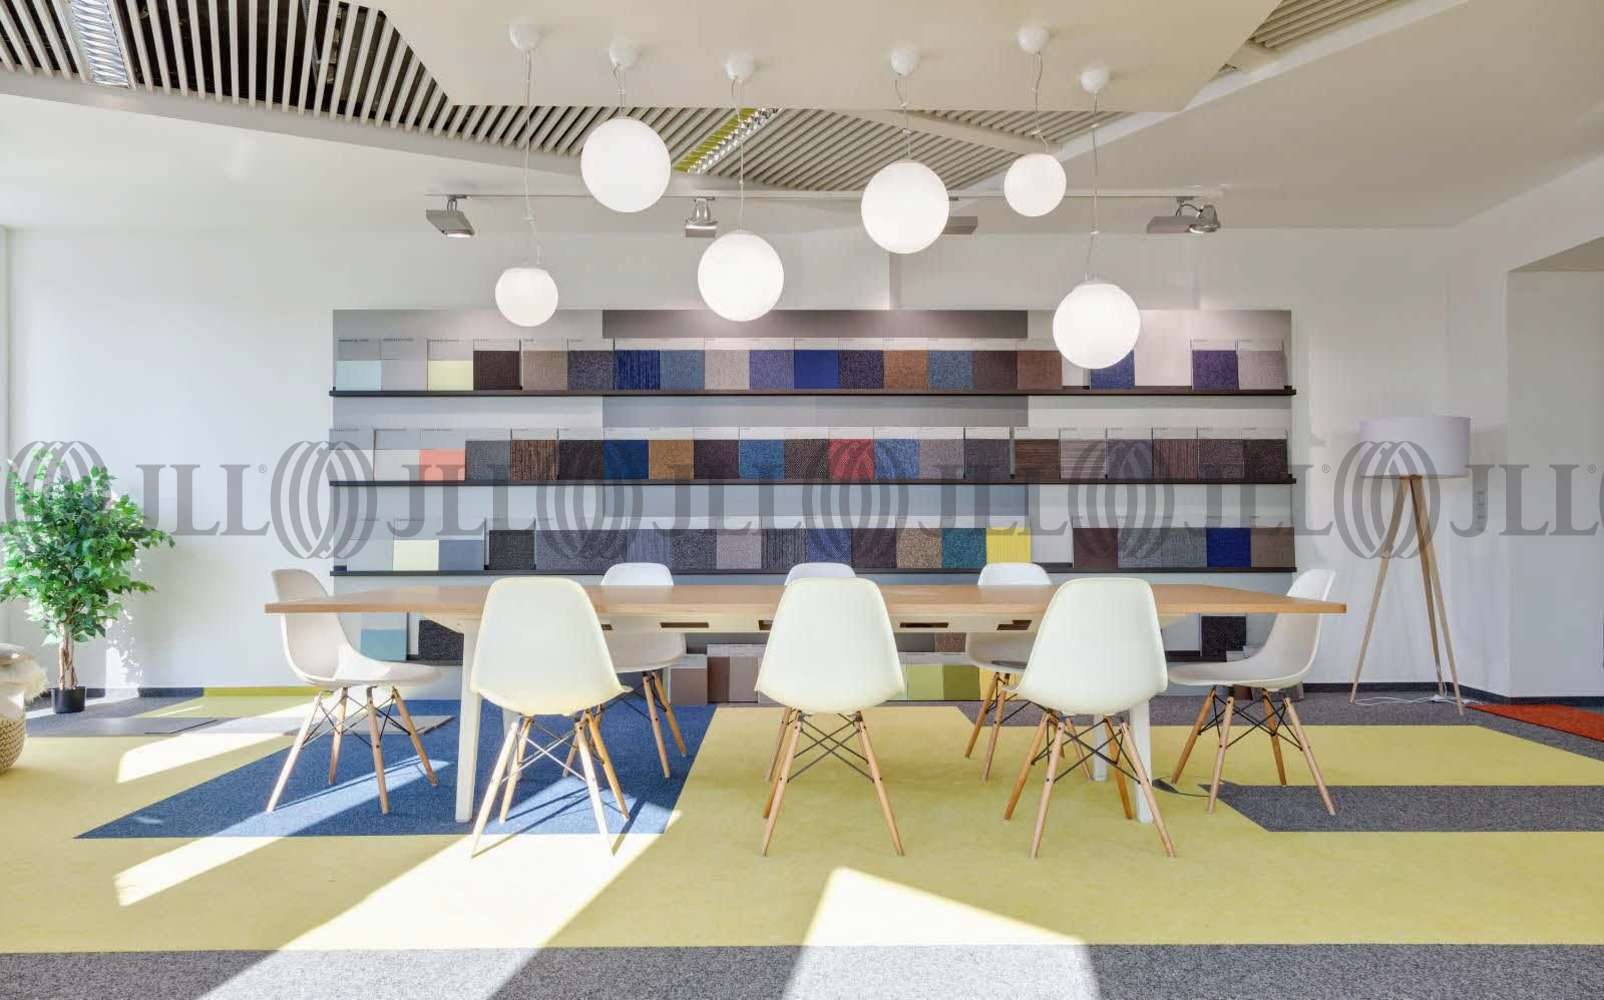 Büros Frankfurt am main, 60439 - Büro - Frankfurt am Main, Niederursel - F1061 - 10563733